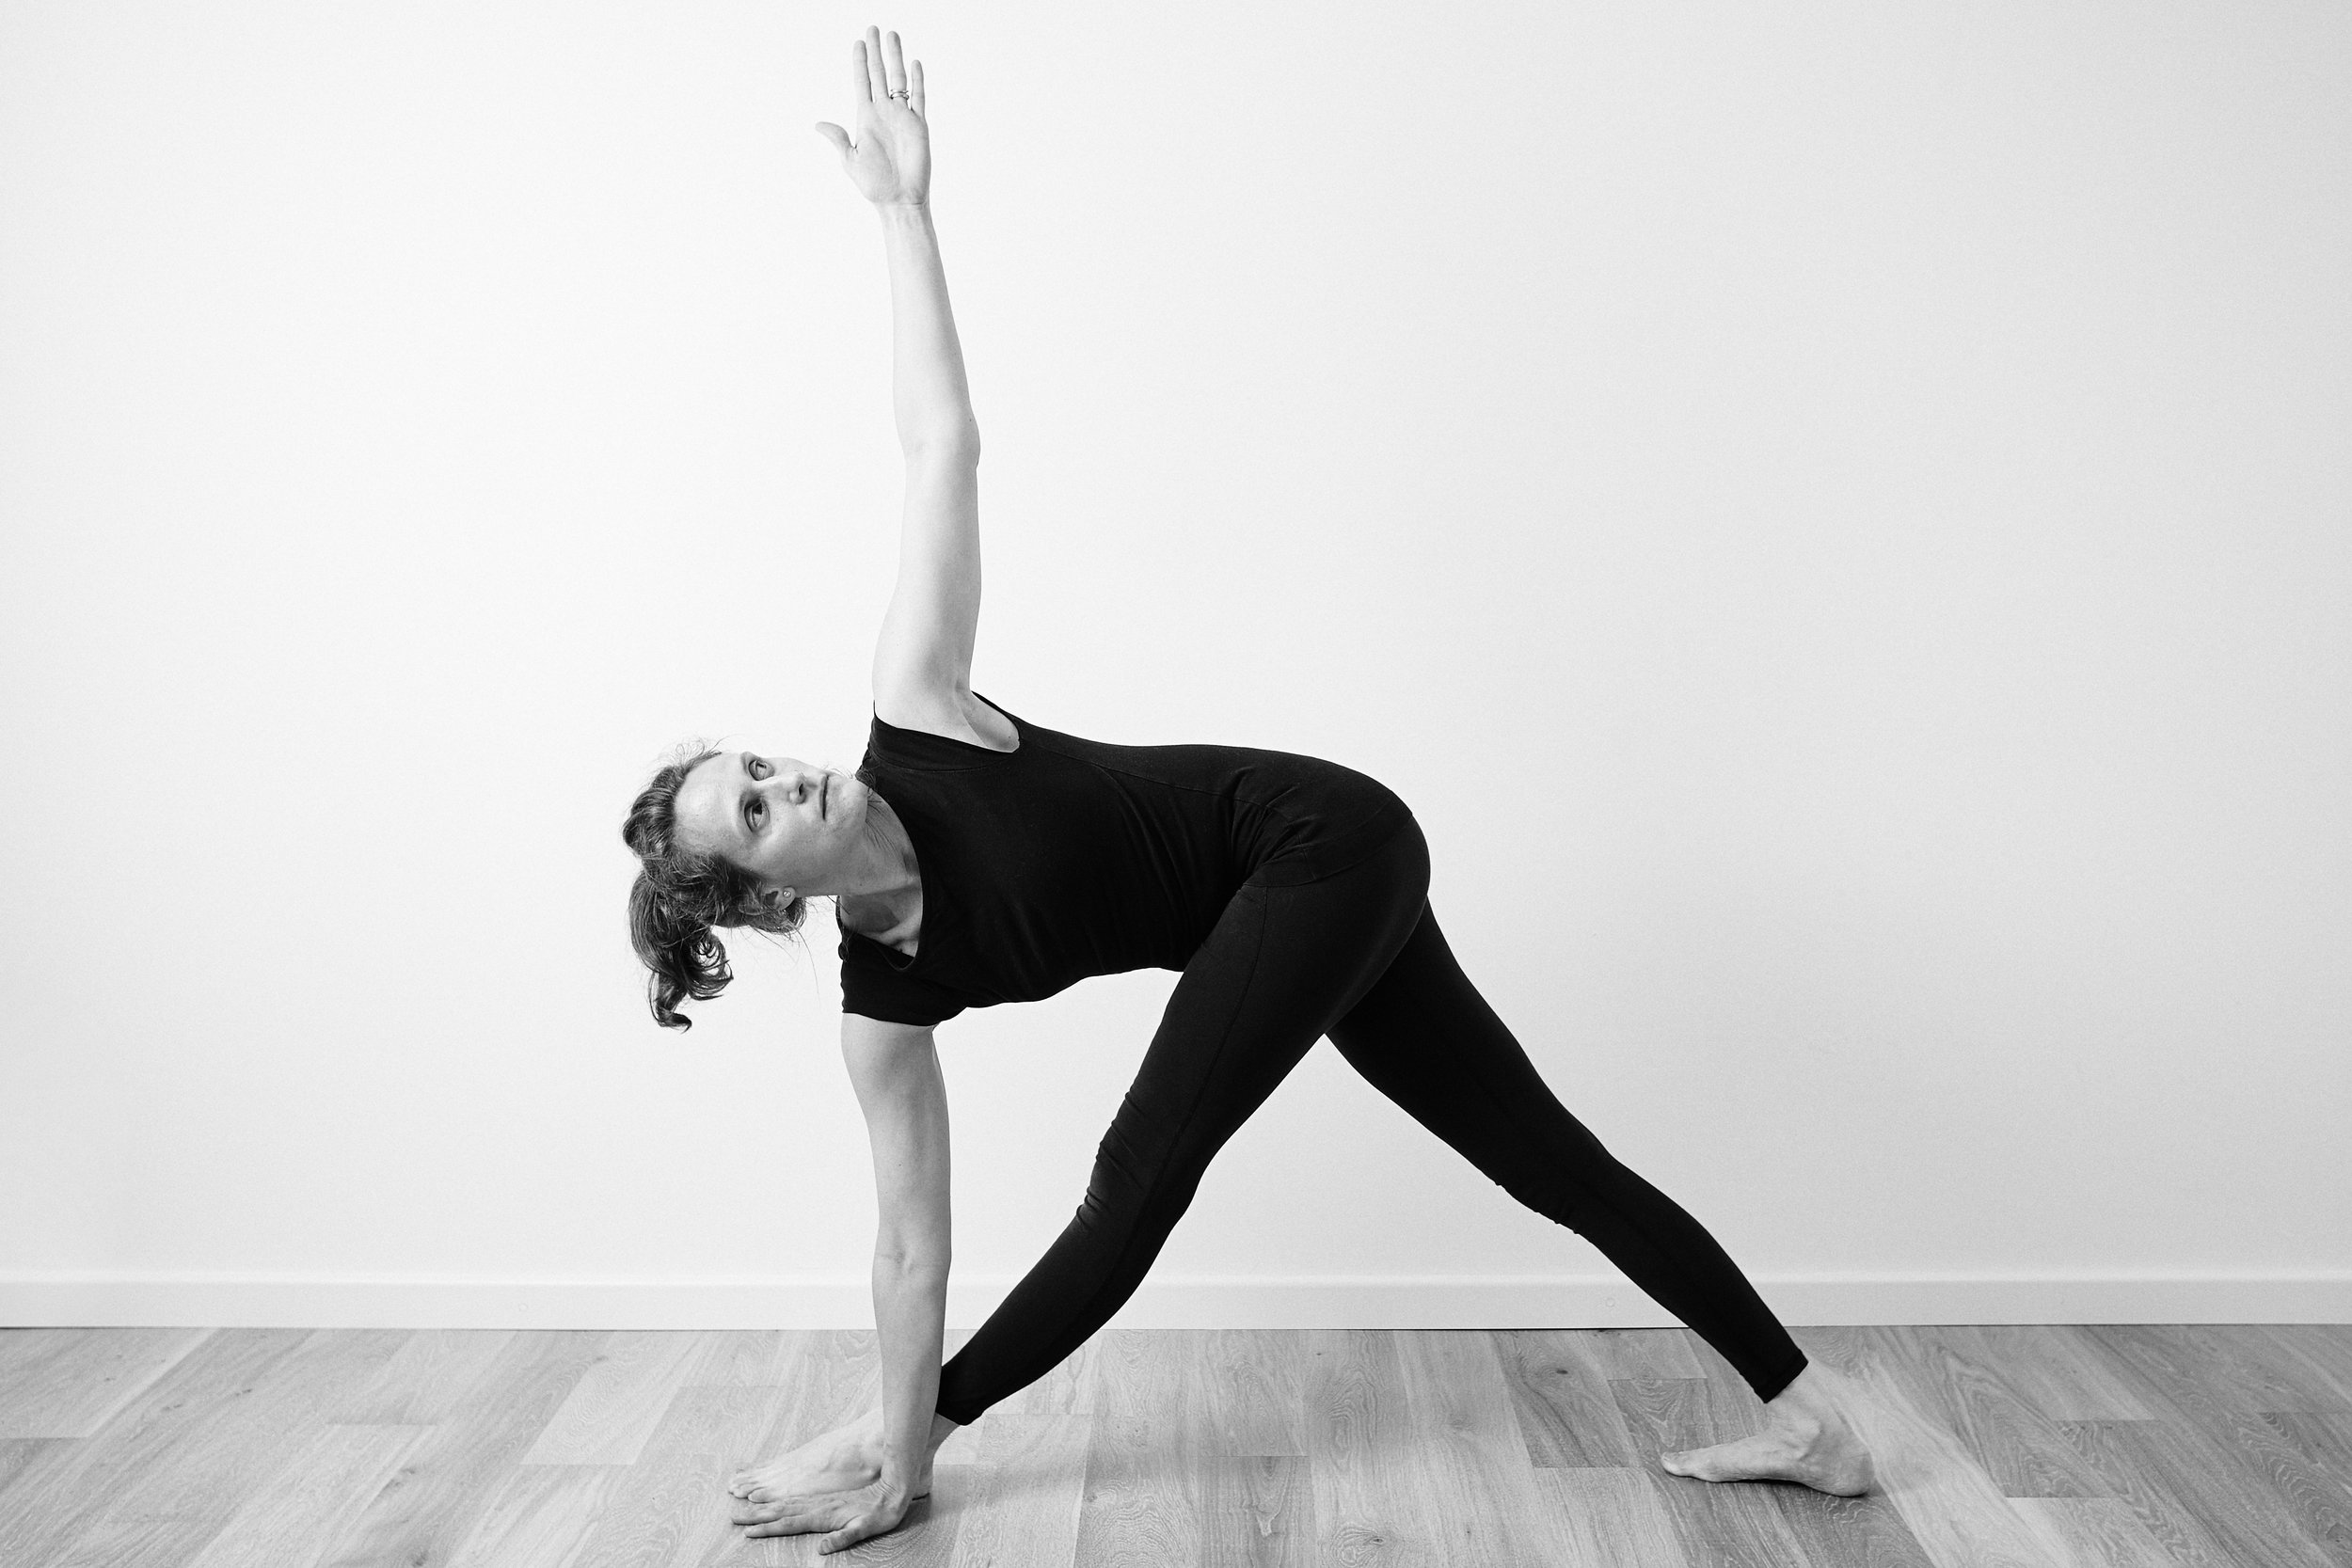 3 04.24.2017 - Appledown Iyengar Yoga Studio00744.jpg